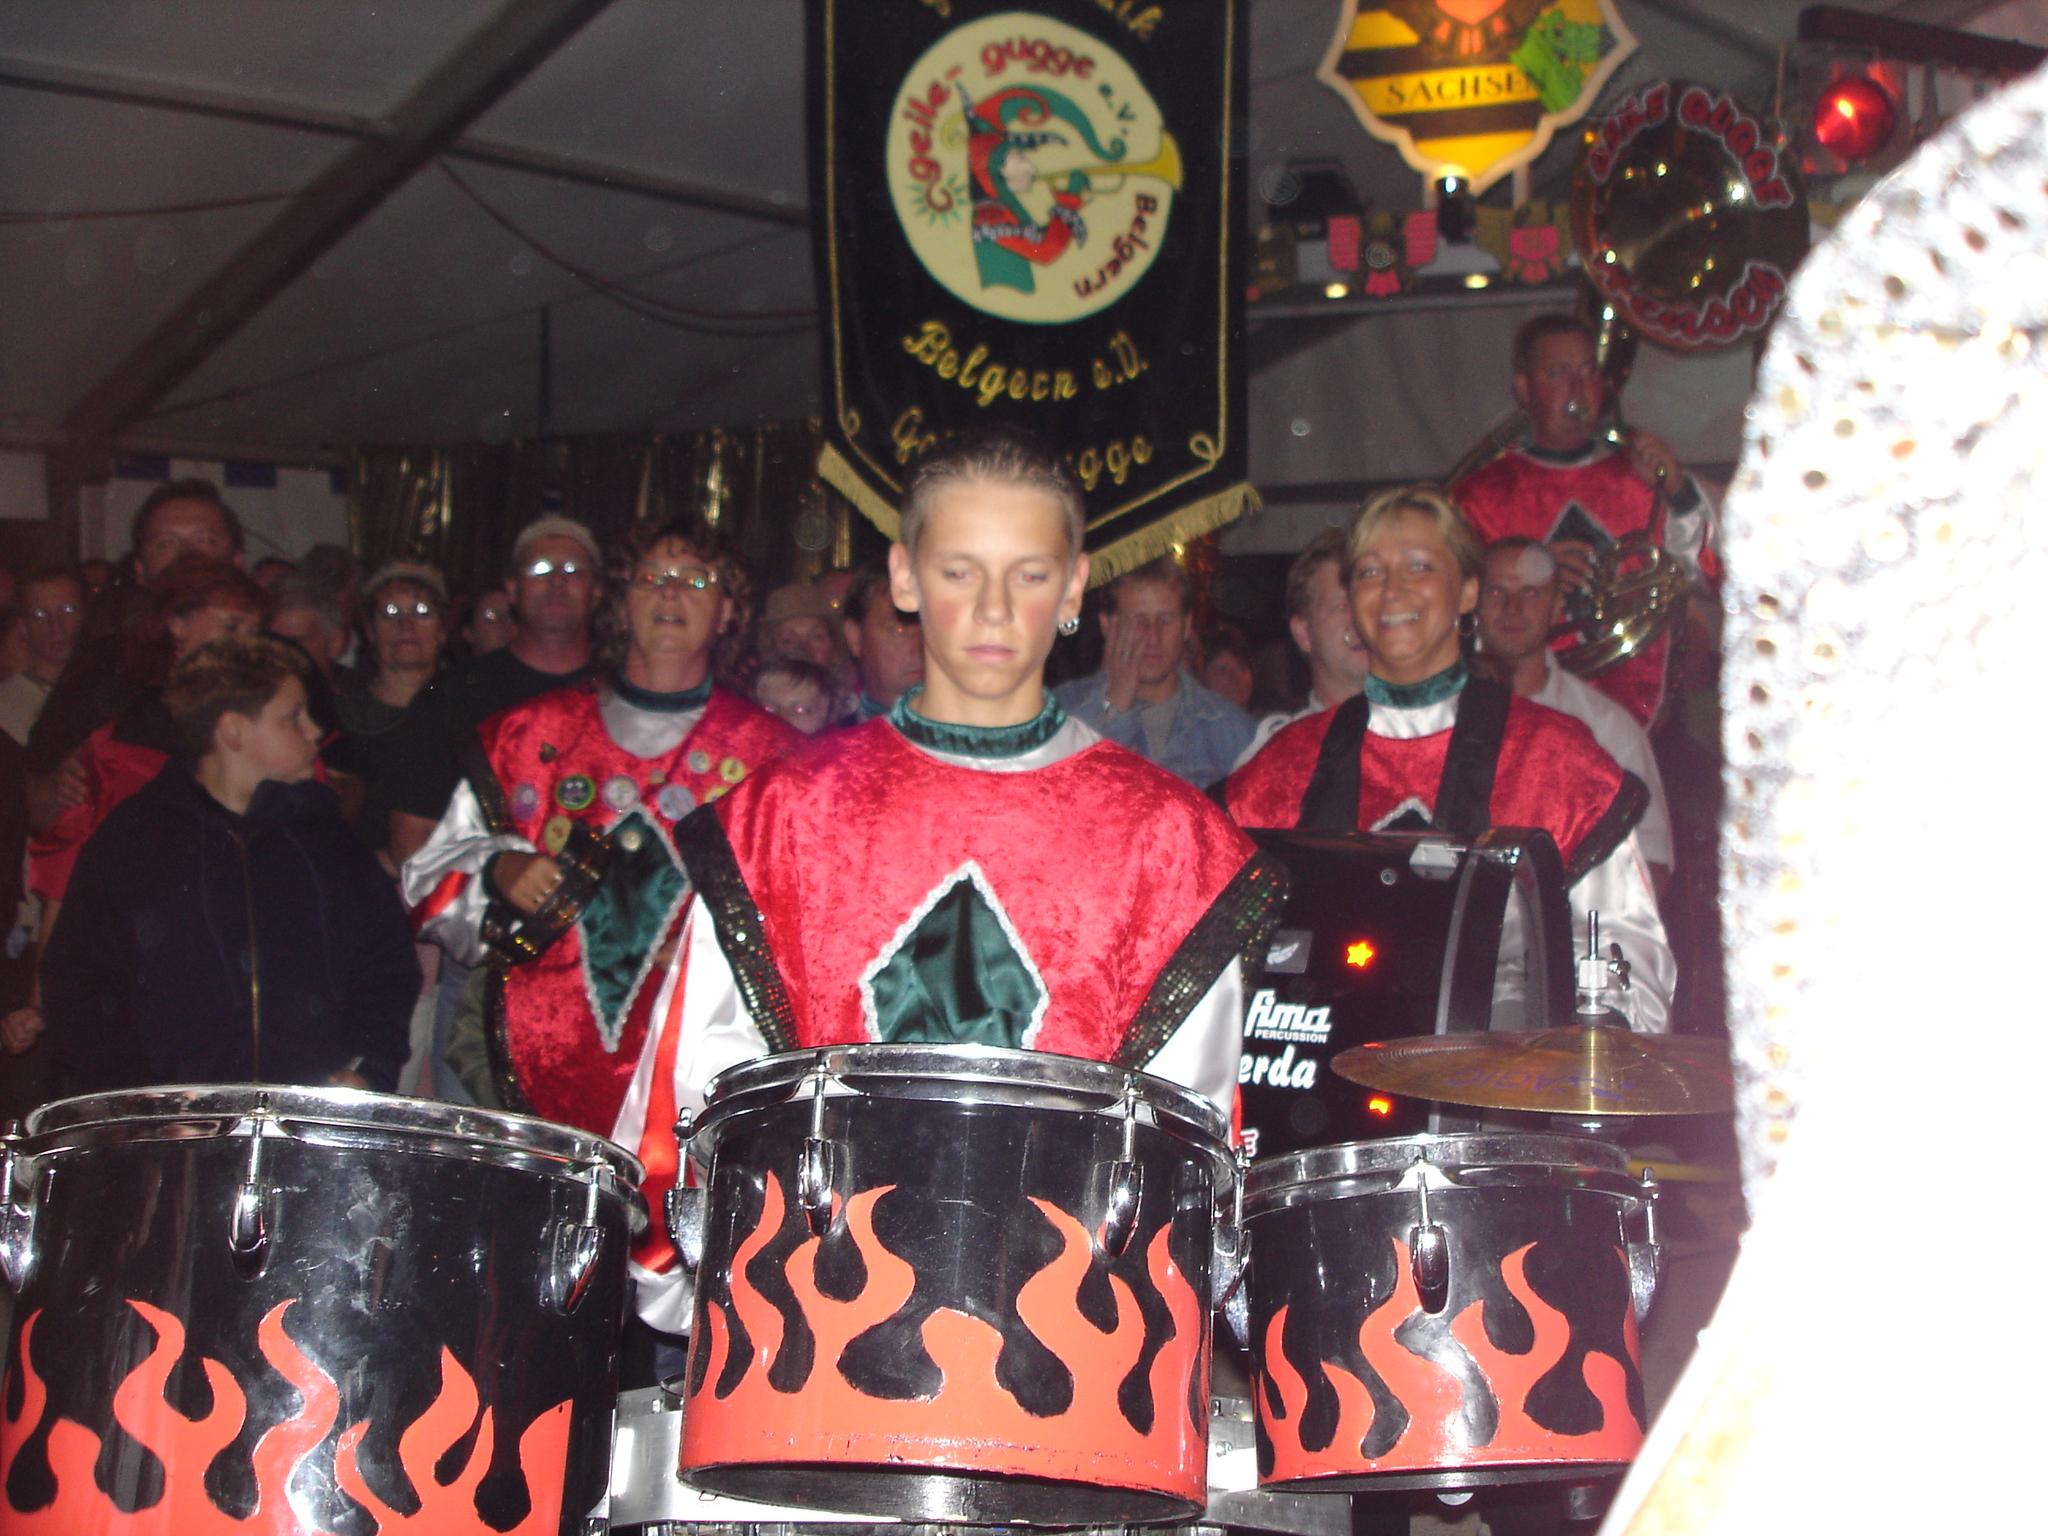 GWST Treffen 2004